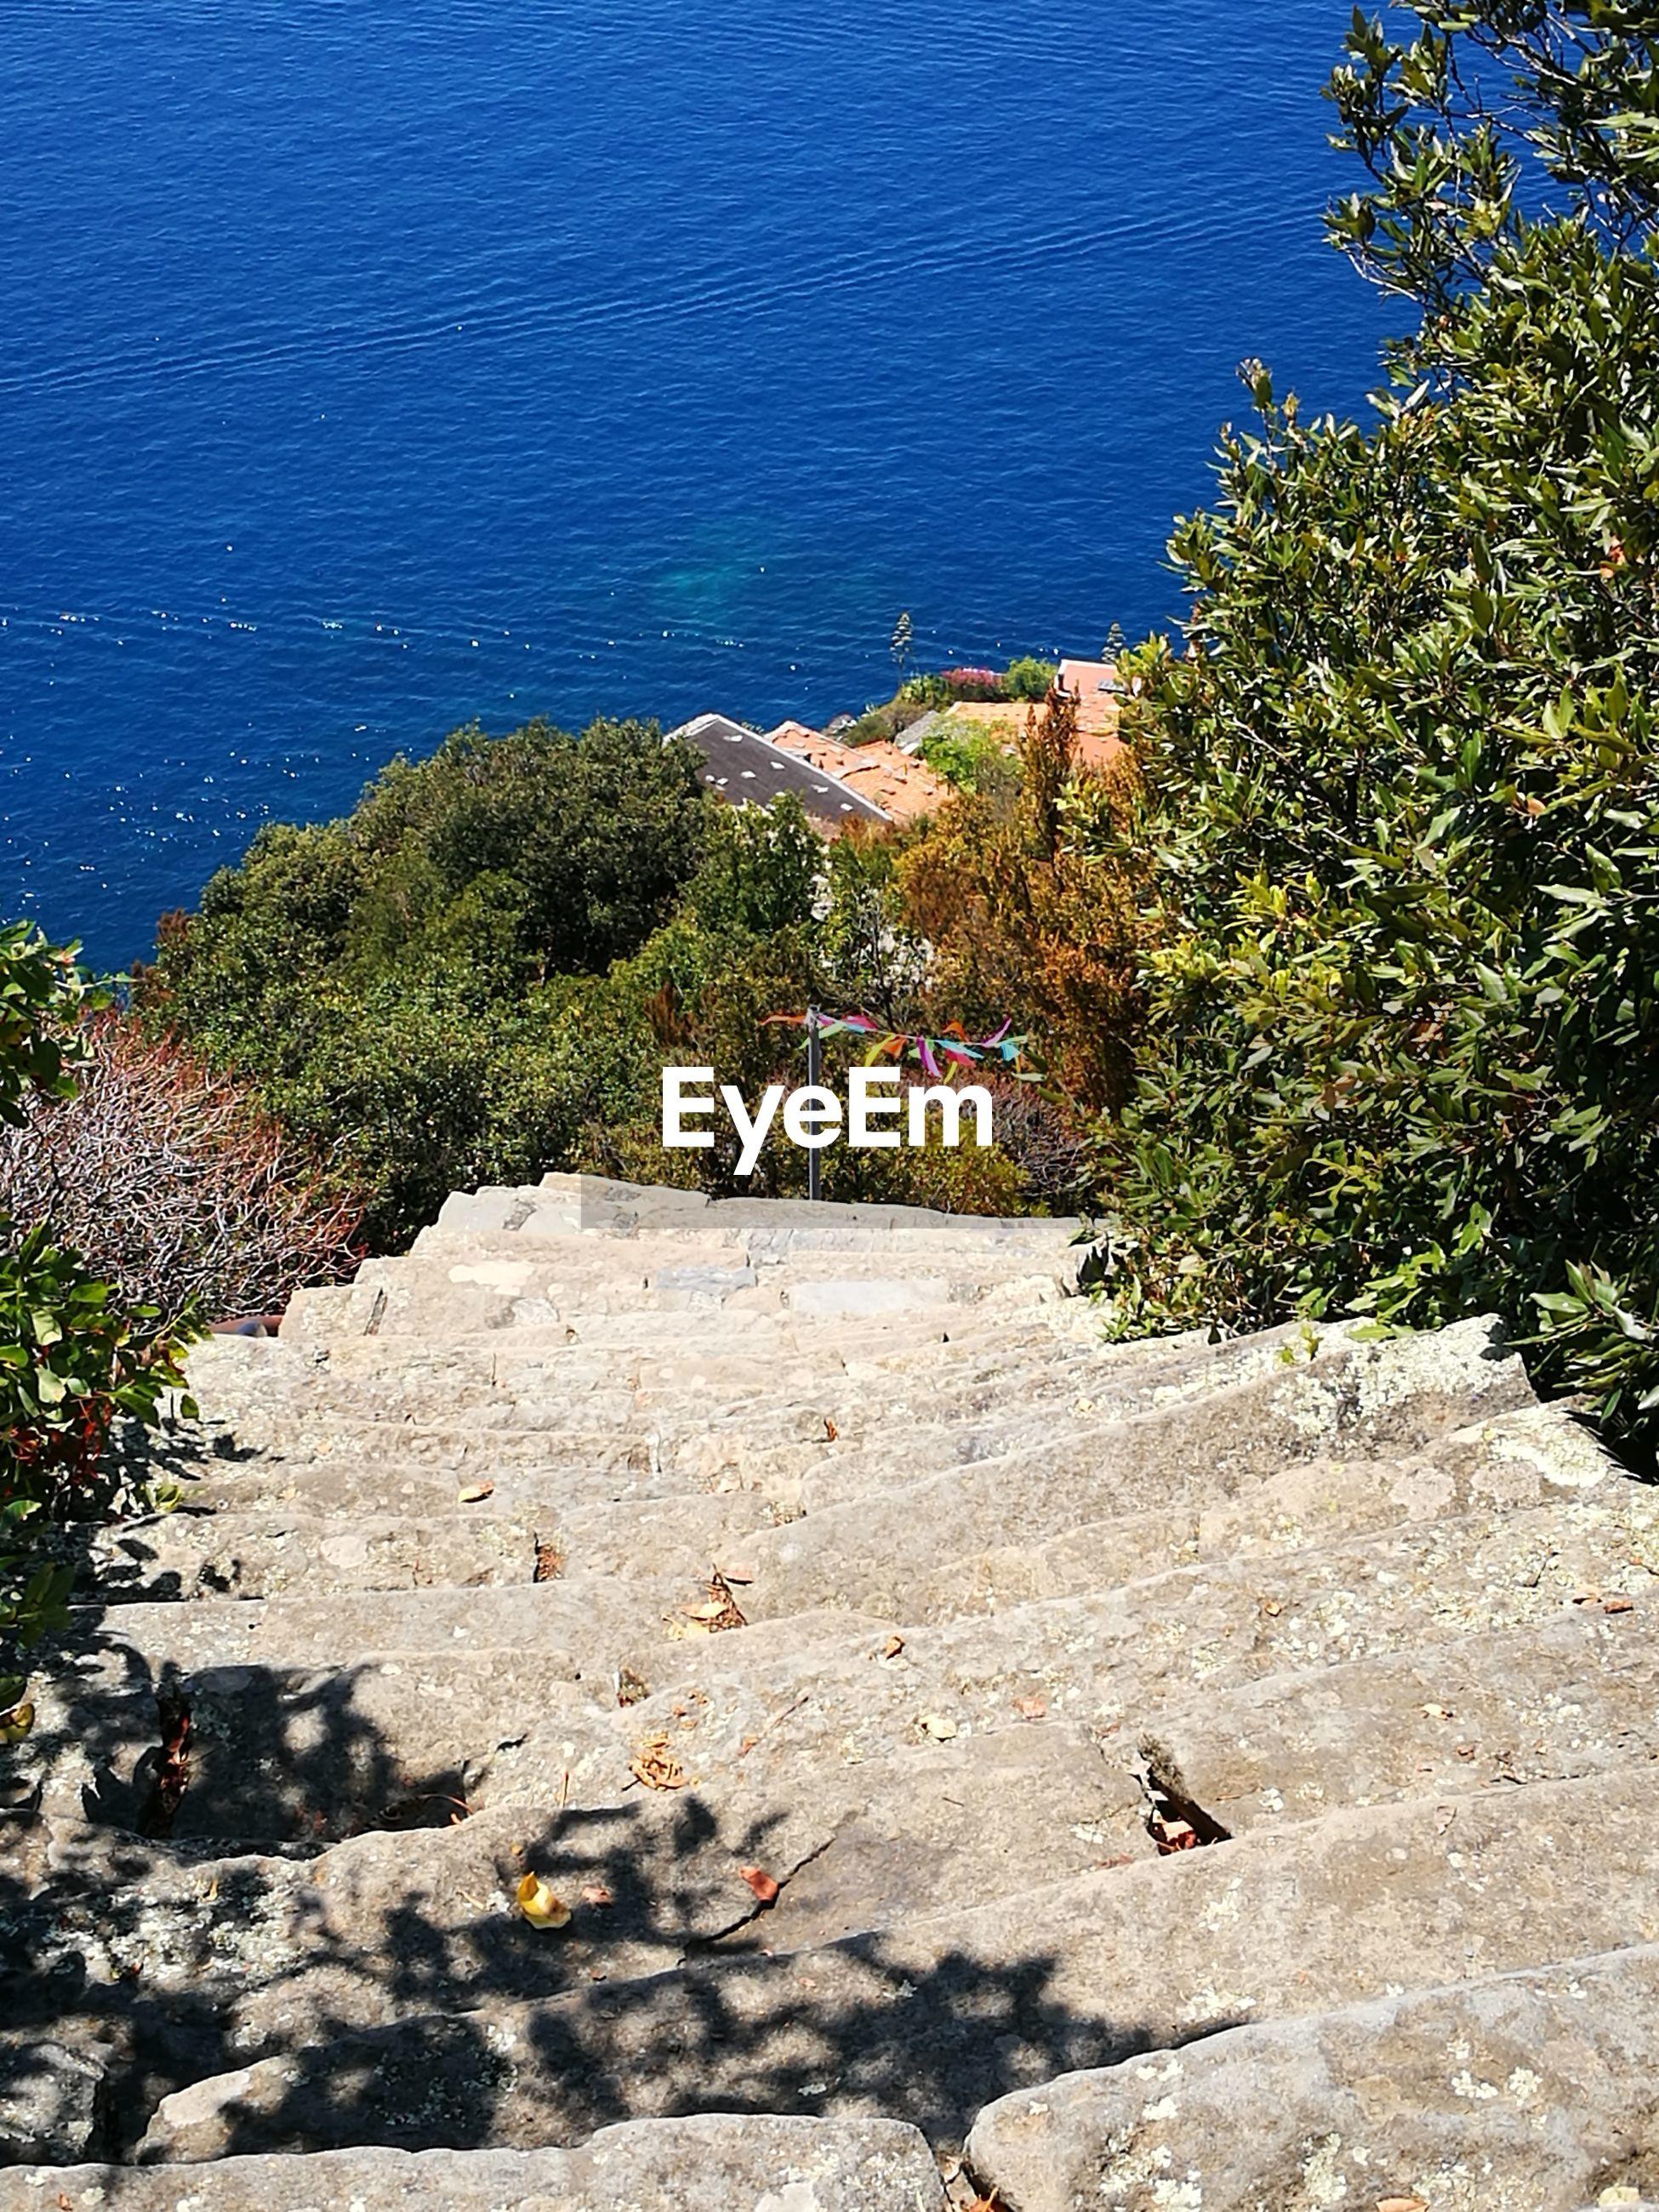 HIGH ANGLE VIEW OF SEA AMIDST PLANTS ON BEACH